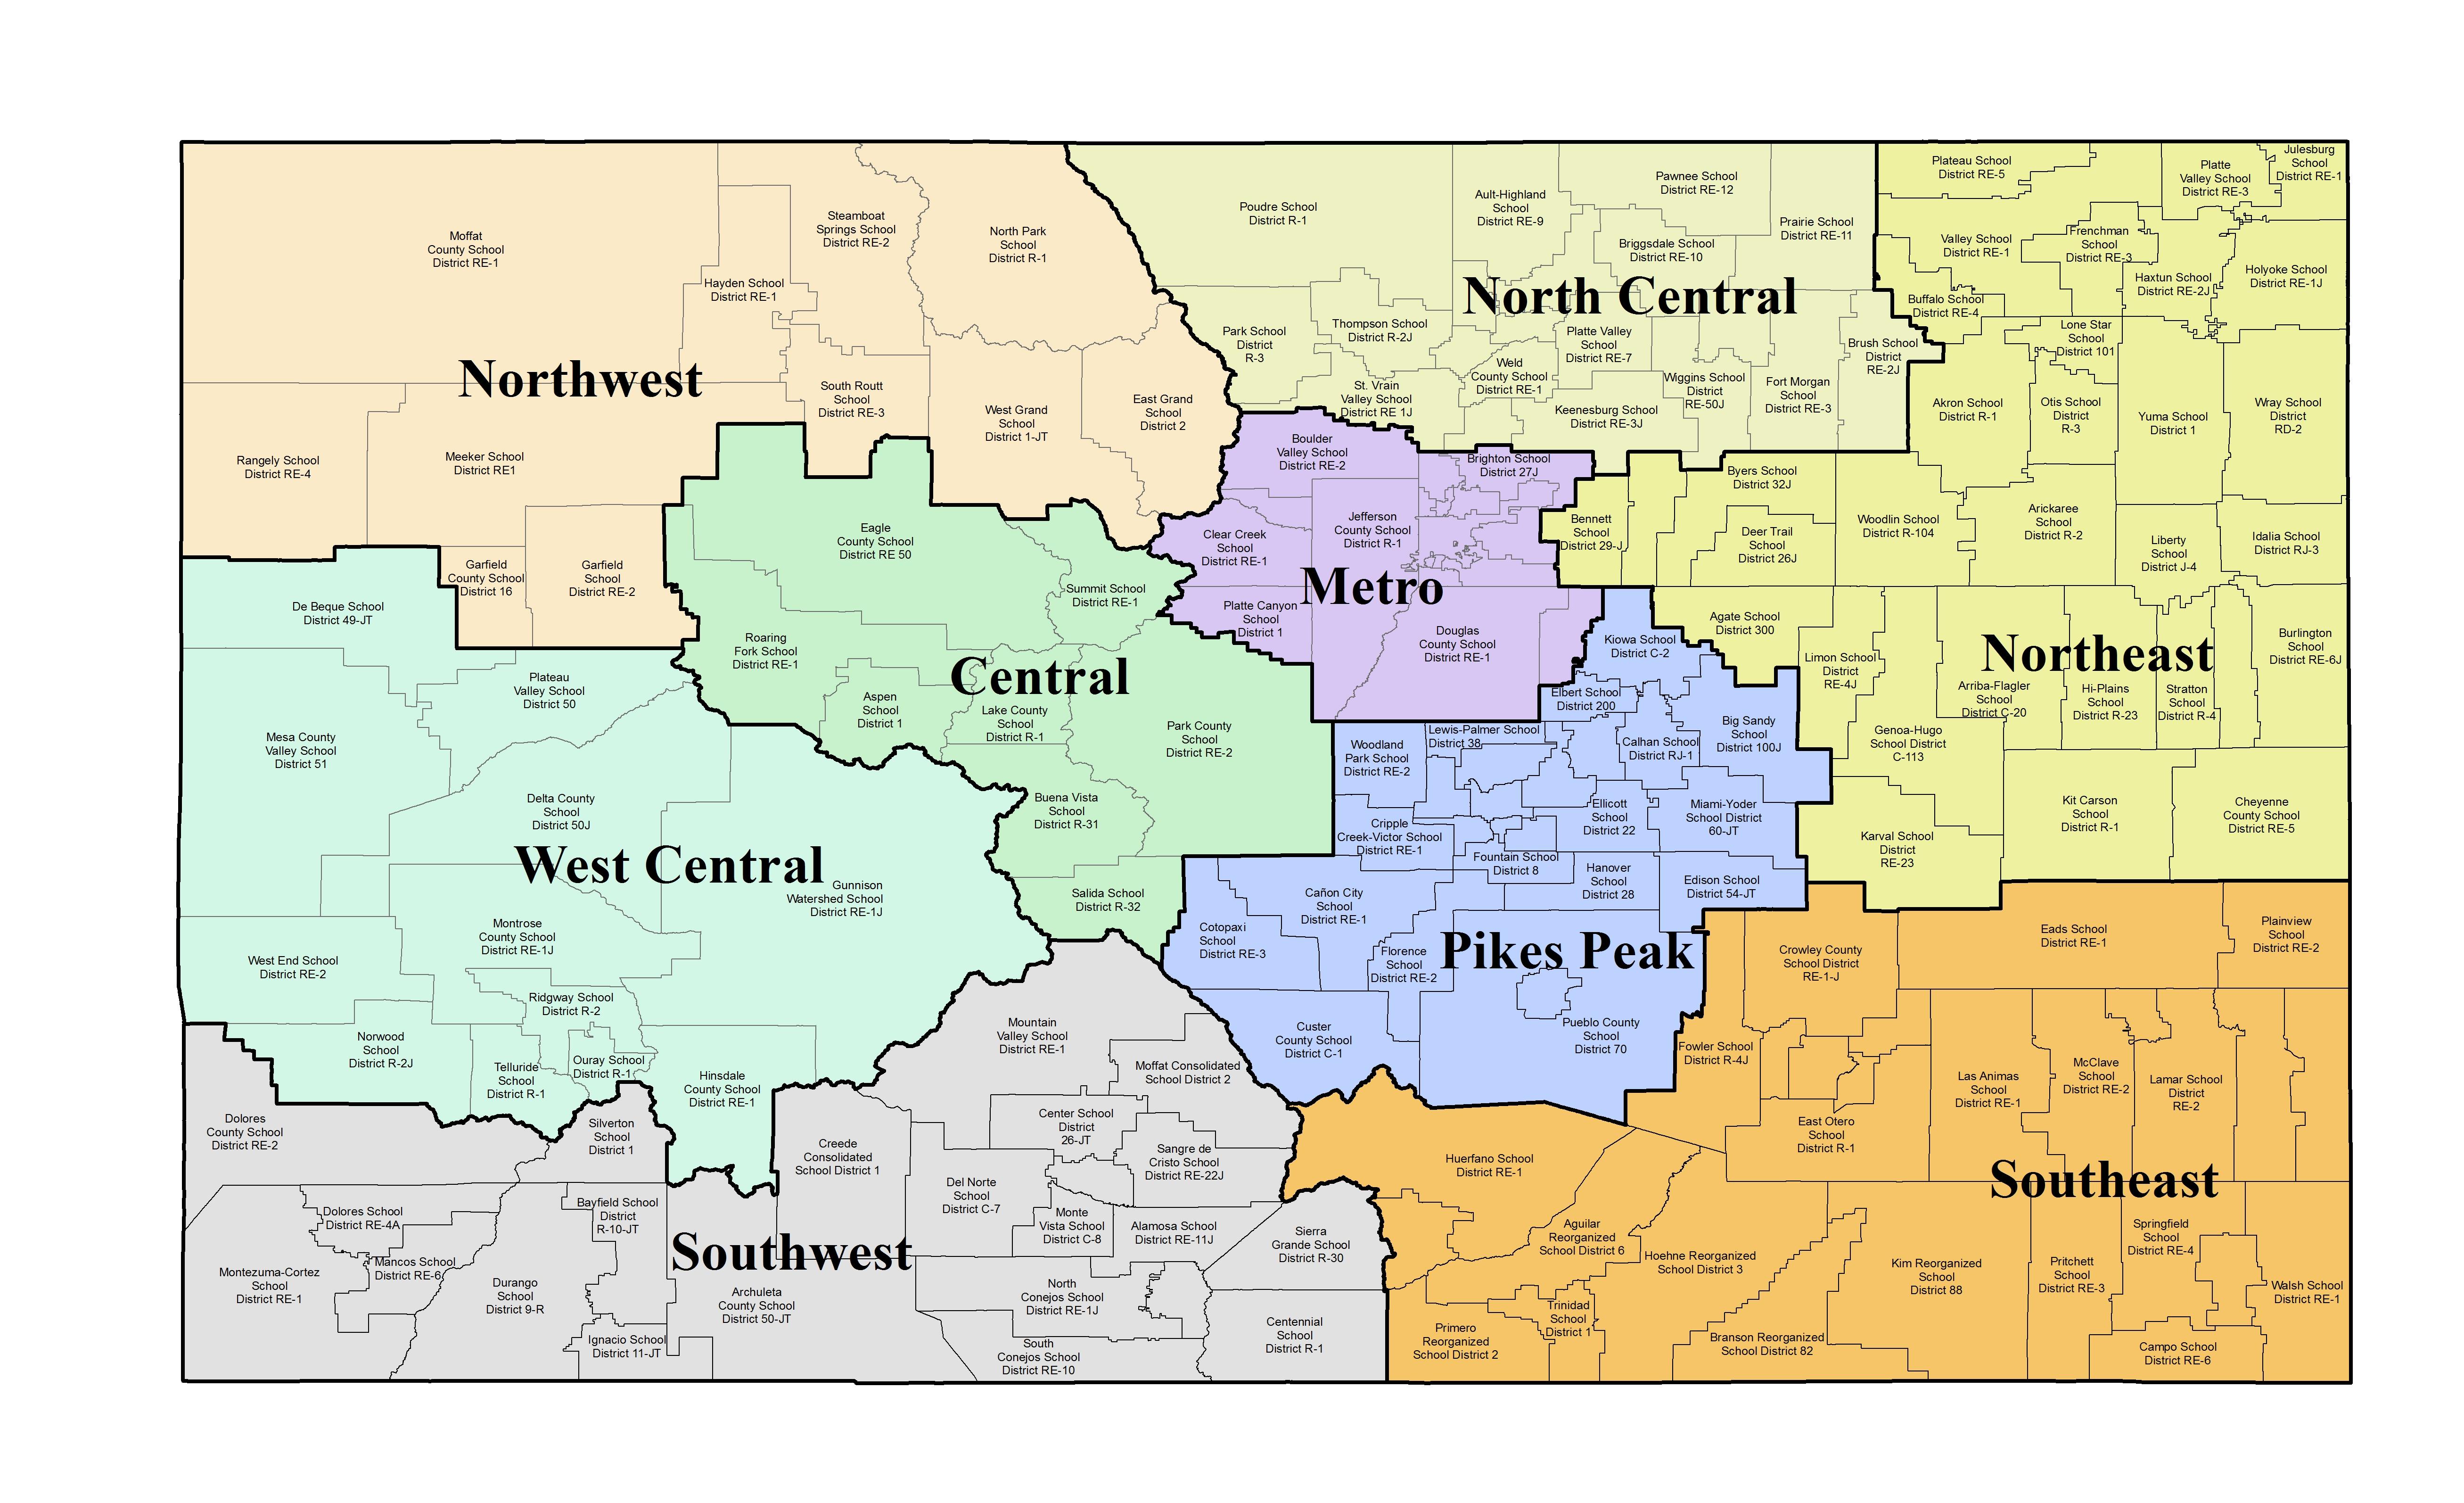 Transportation Advisory Council Full Size Map